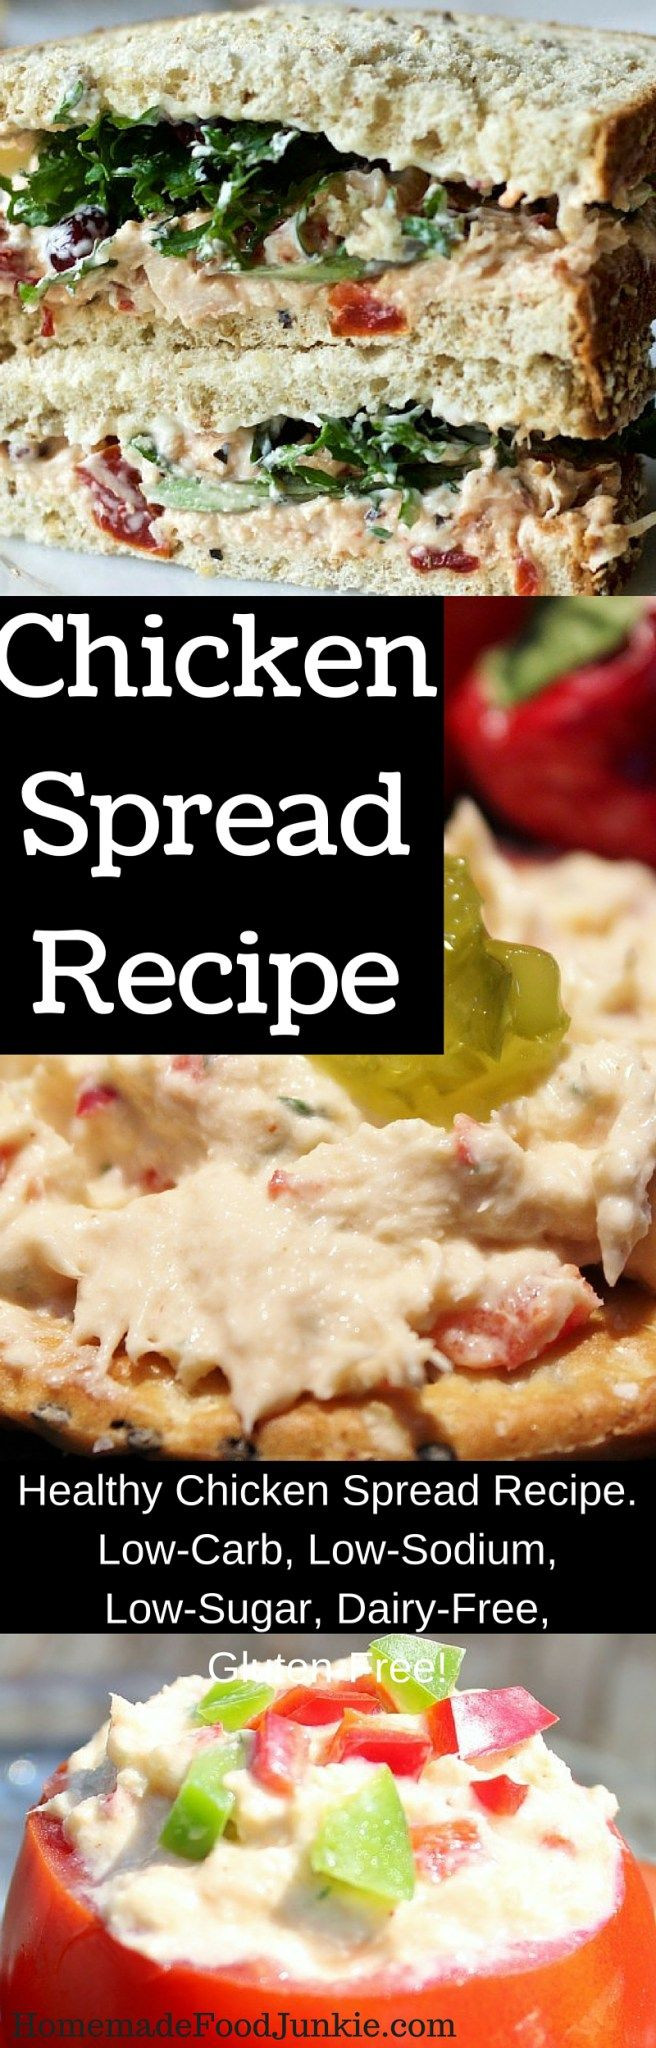 Low Carb Low Sugar Recipes  Healthy chicken spread recipe Low Carb Low Sodium Low